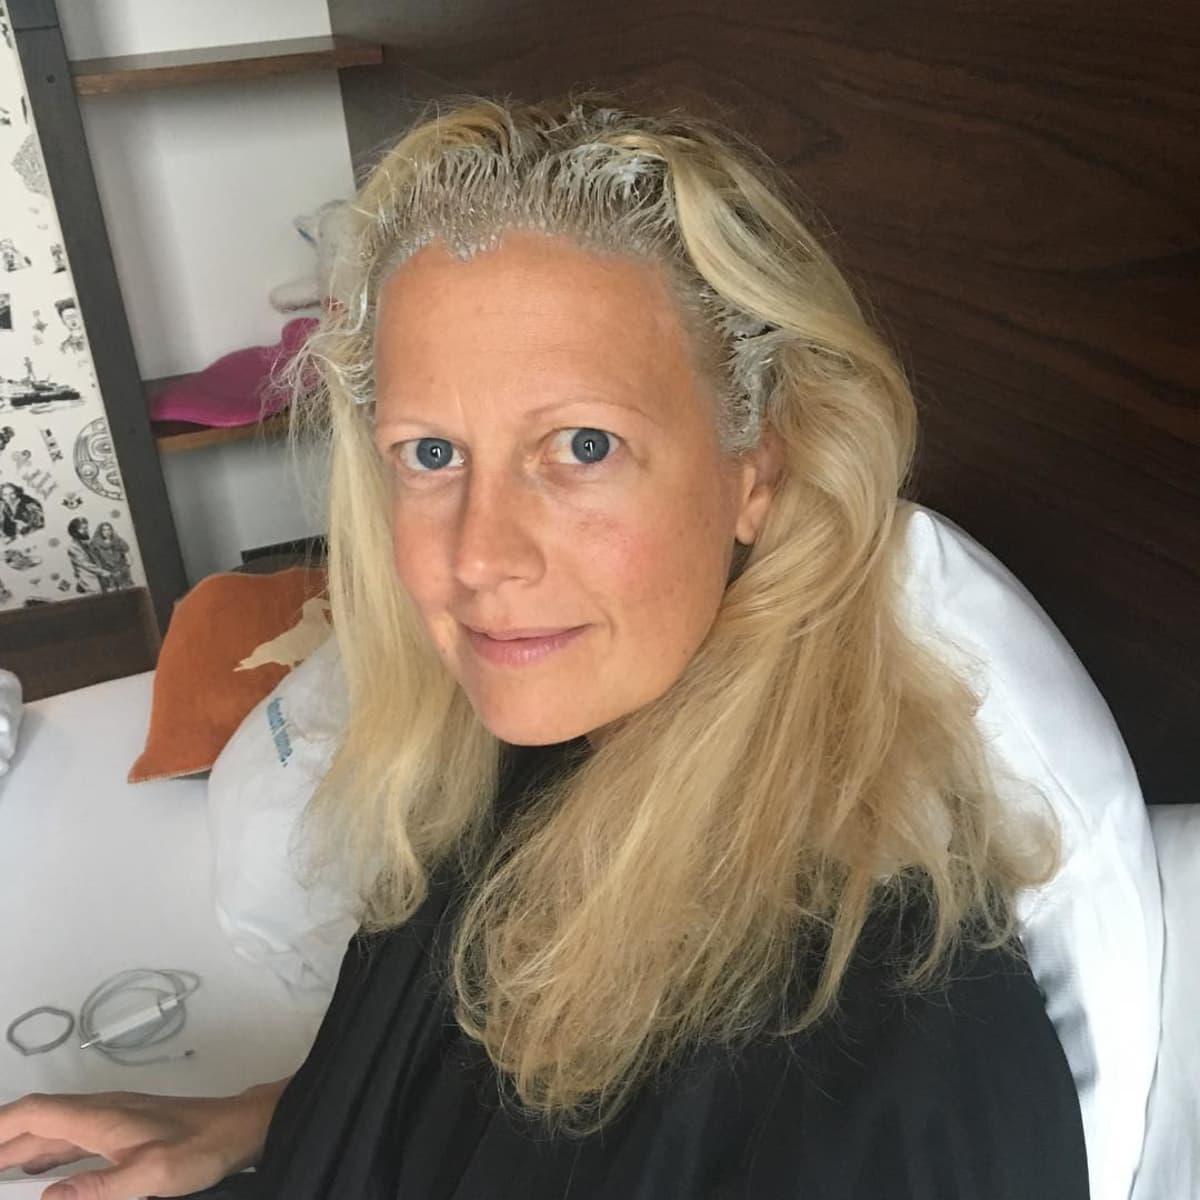 Barbara Schöneberger Ungeschminkt